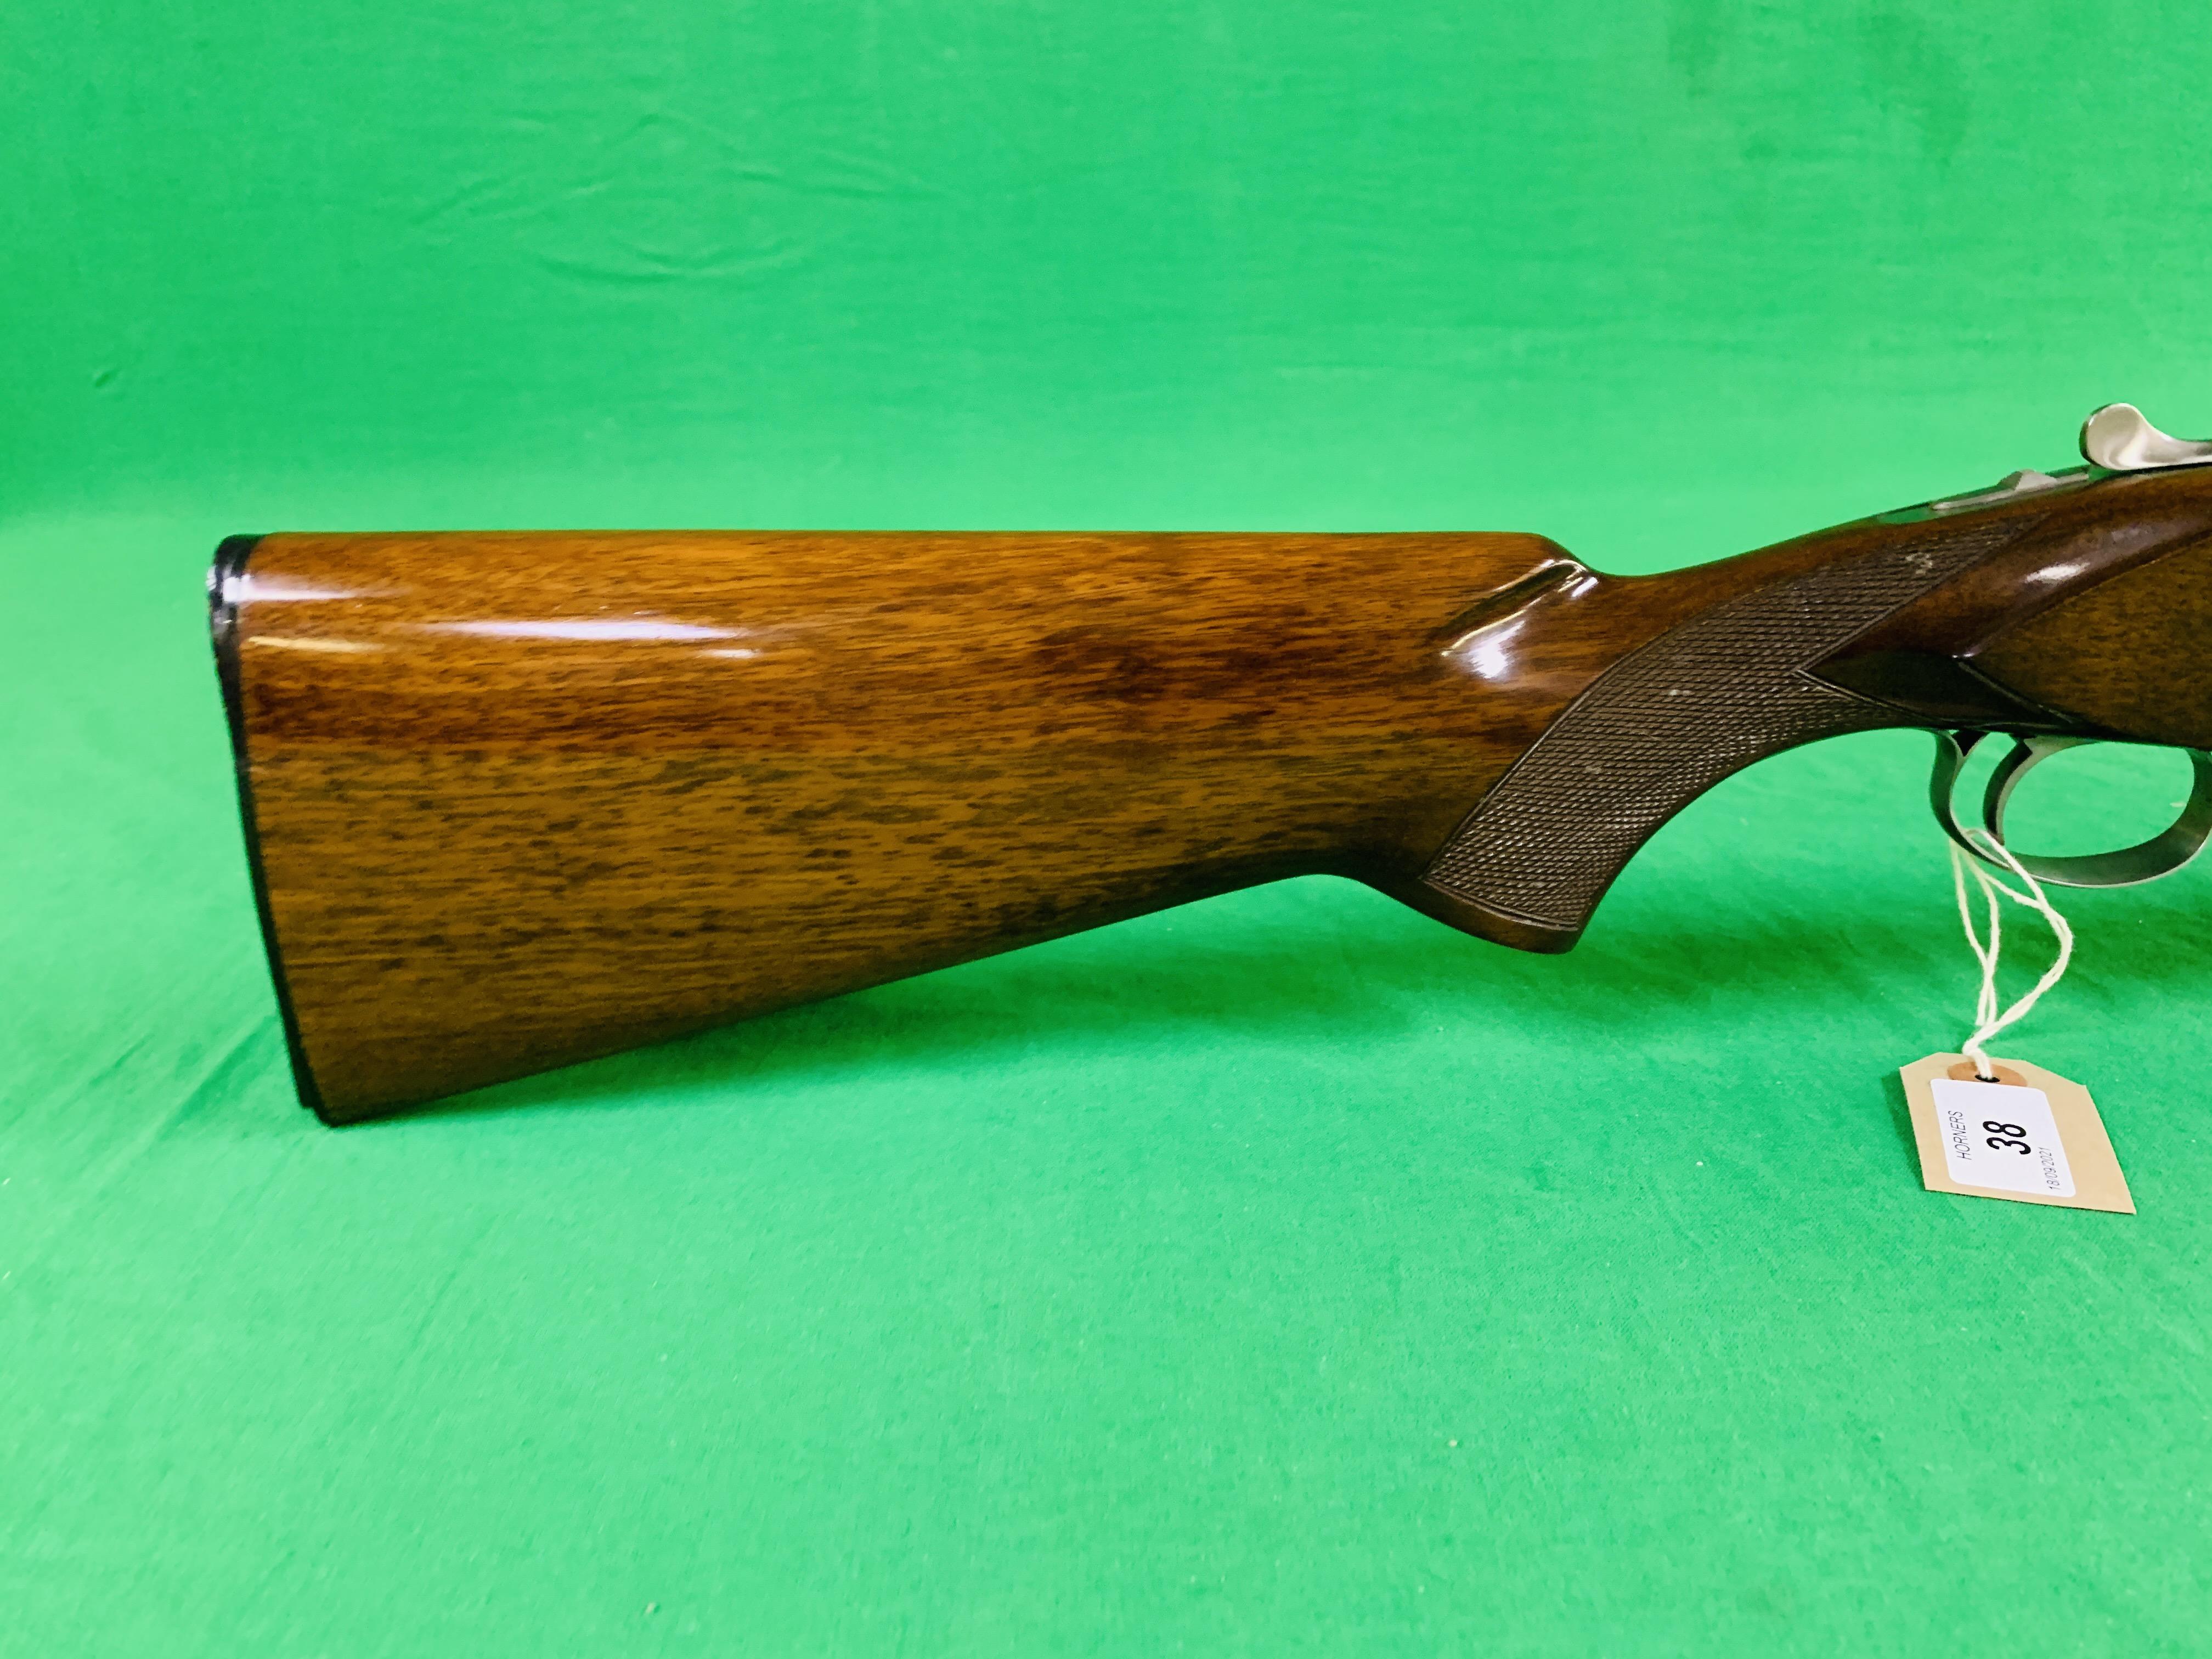 NIKKO 5000 12 BORE OVER AND UNDER SHOTGUN # K629564 - FIXED CHOKE, - Image 4 of 8